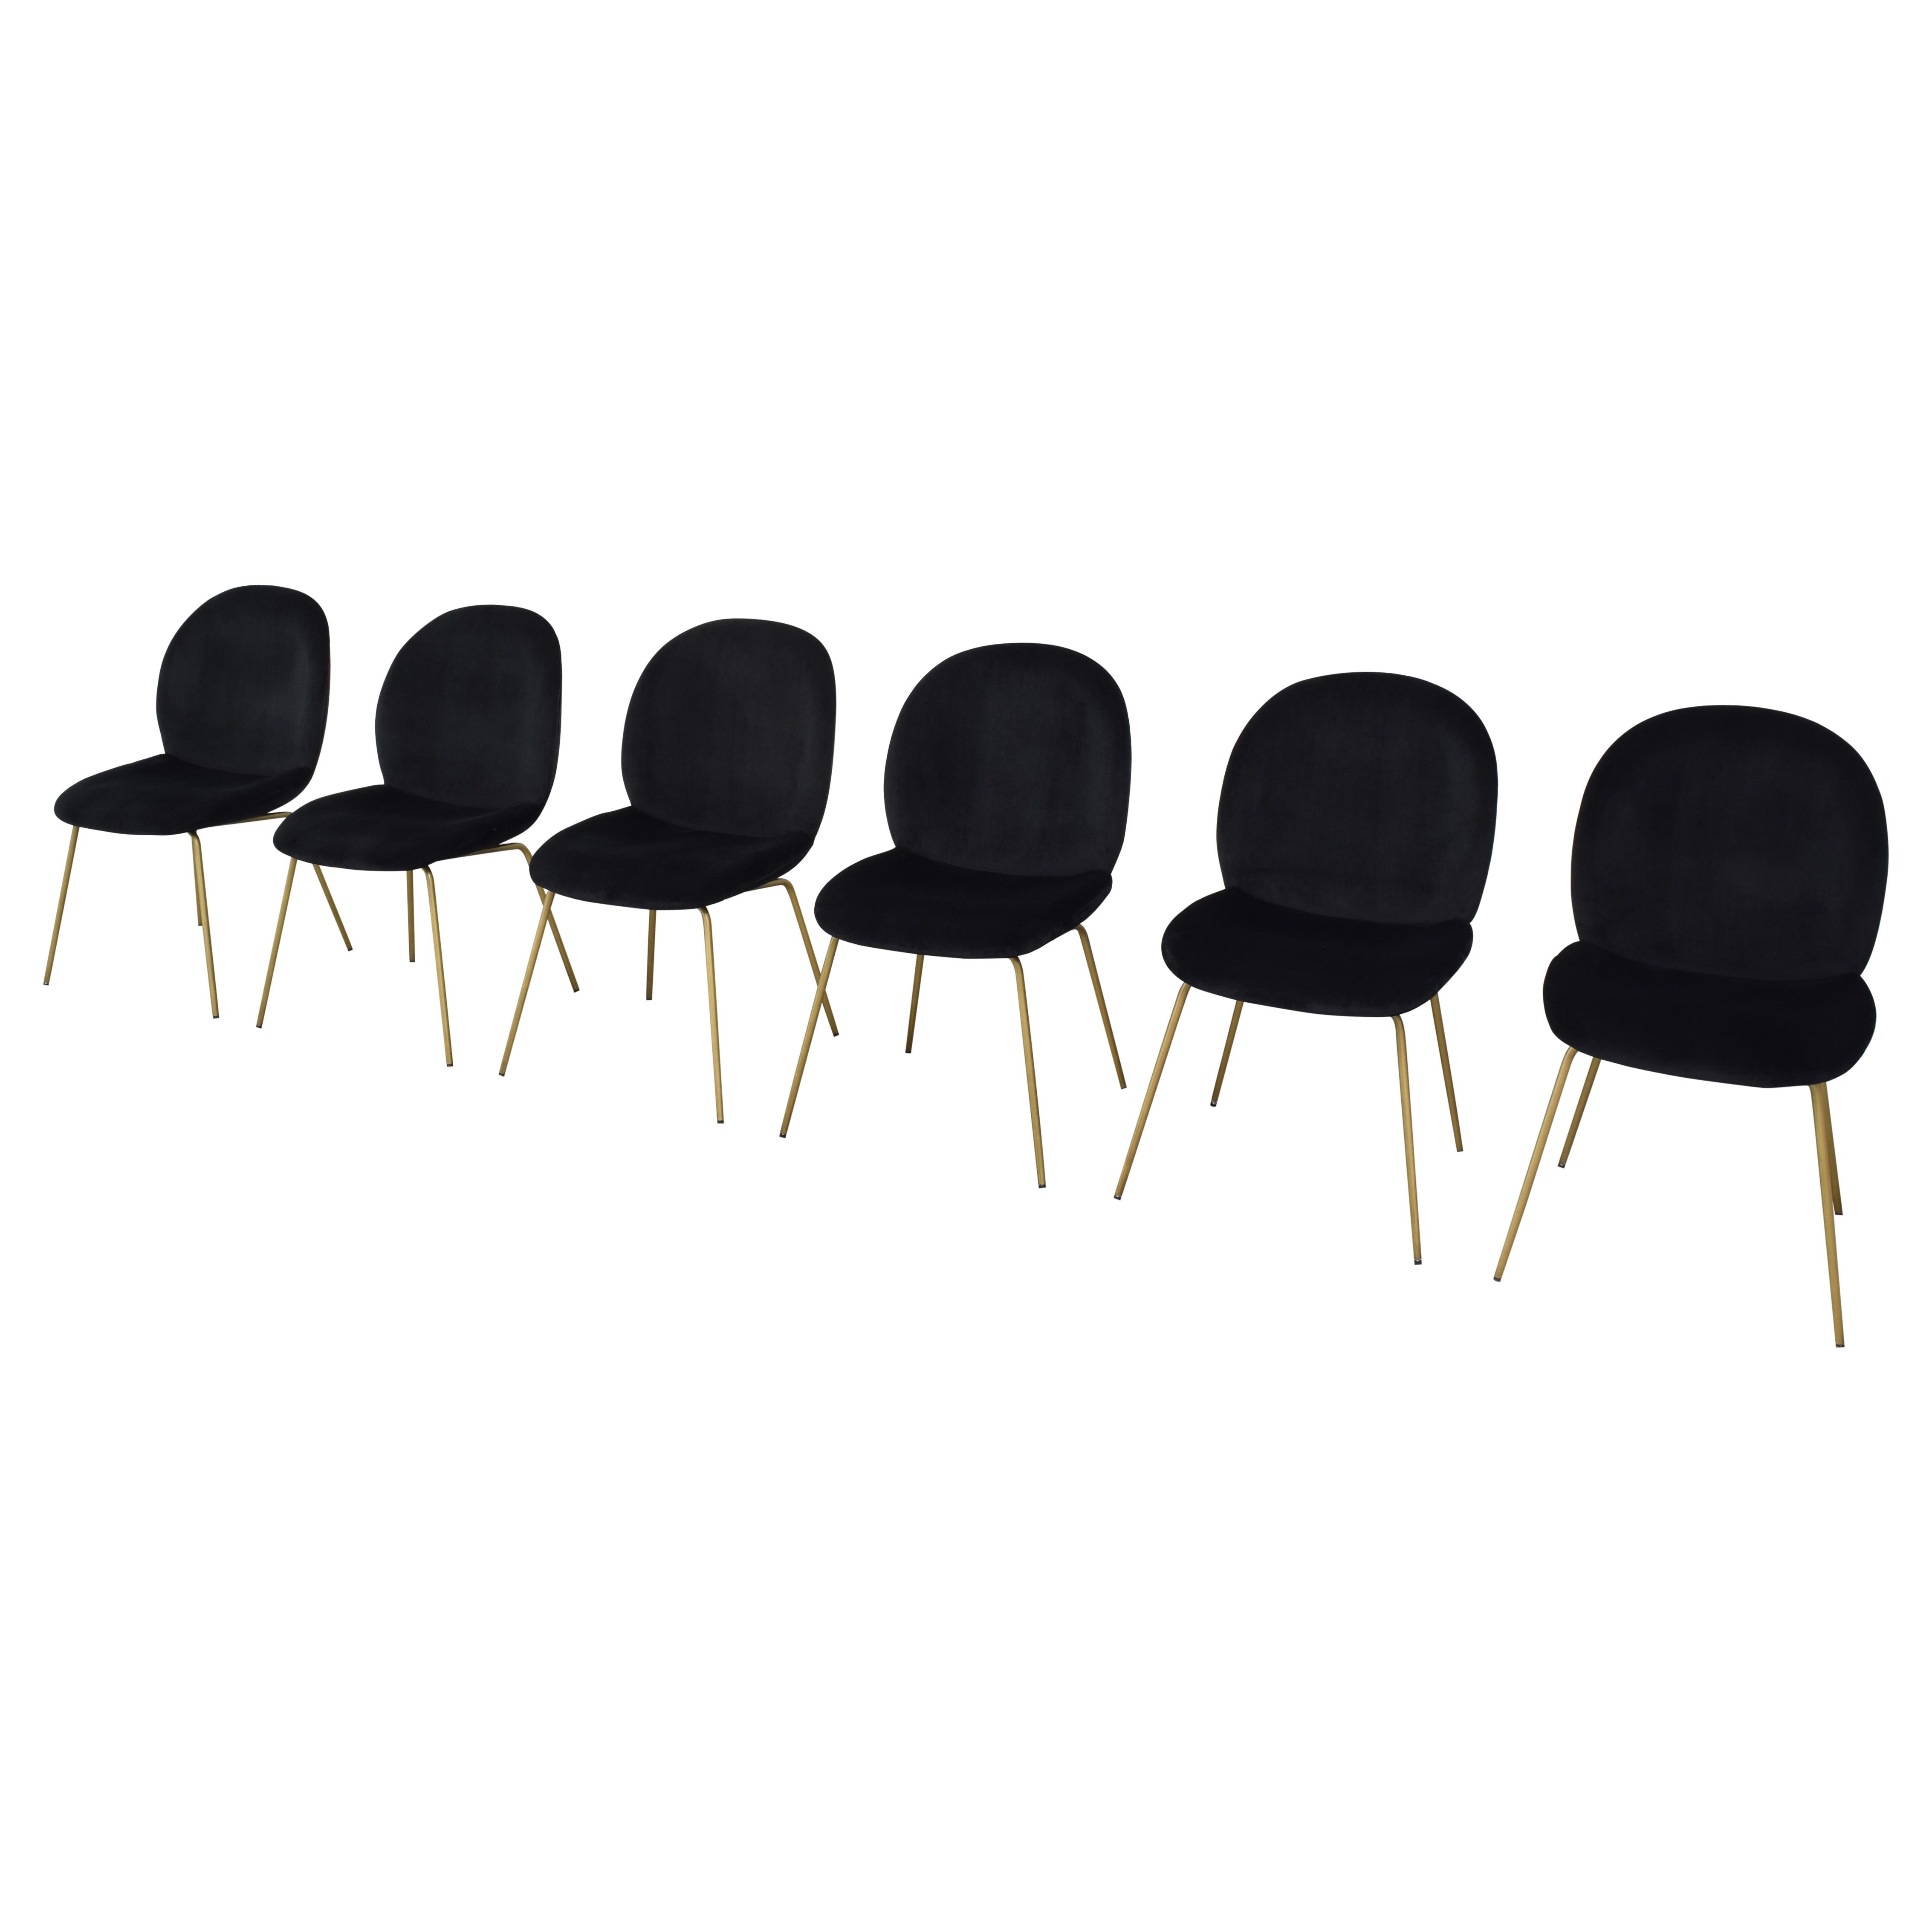 World Market World Market Vivian Velvet Dining Chairs on sale